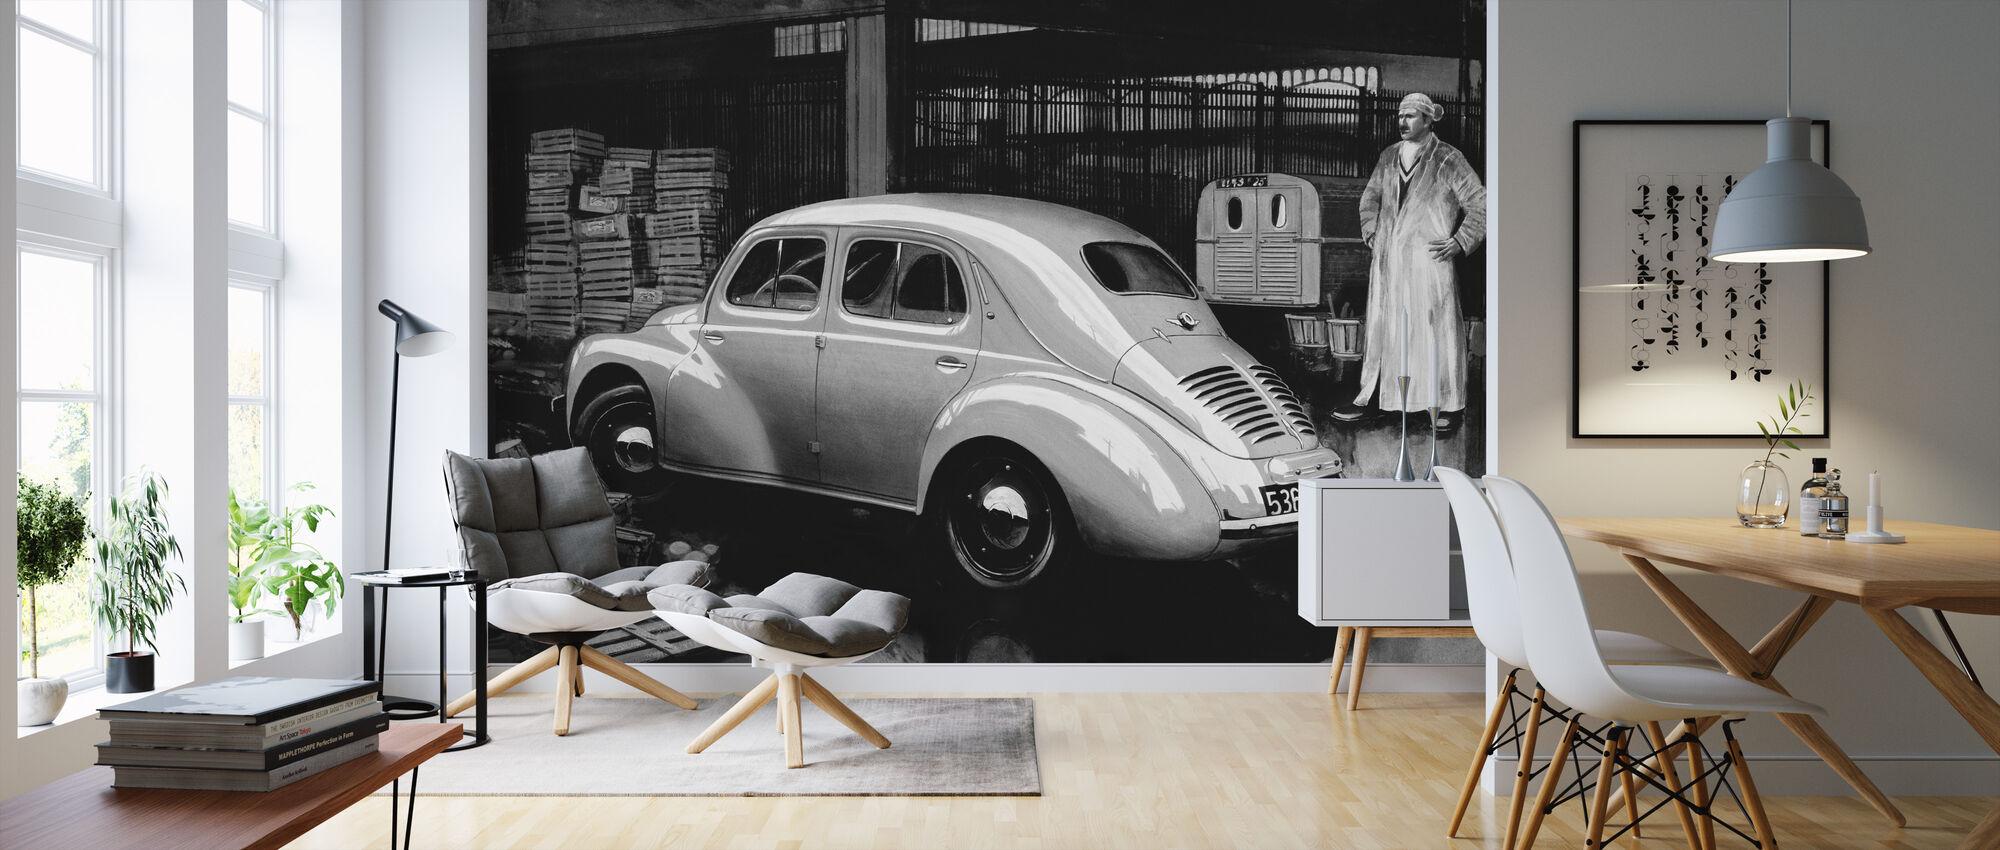 Classic Car BW - Wallpaper - Living Room